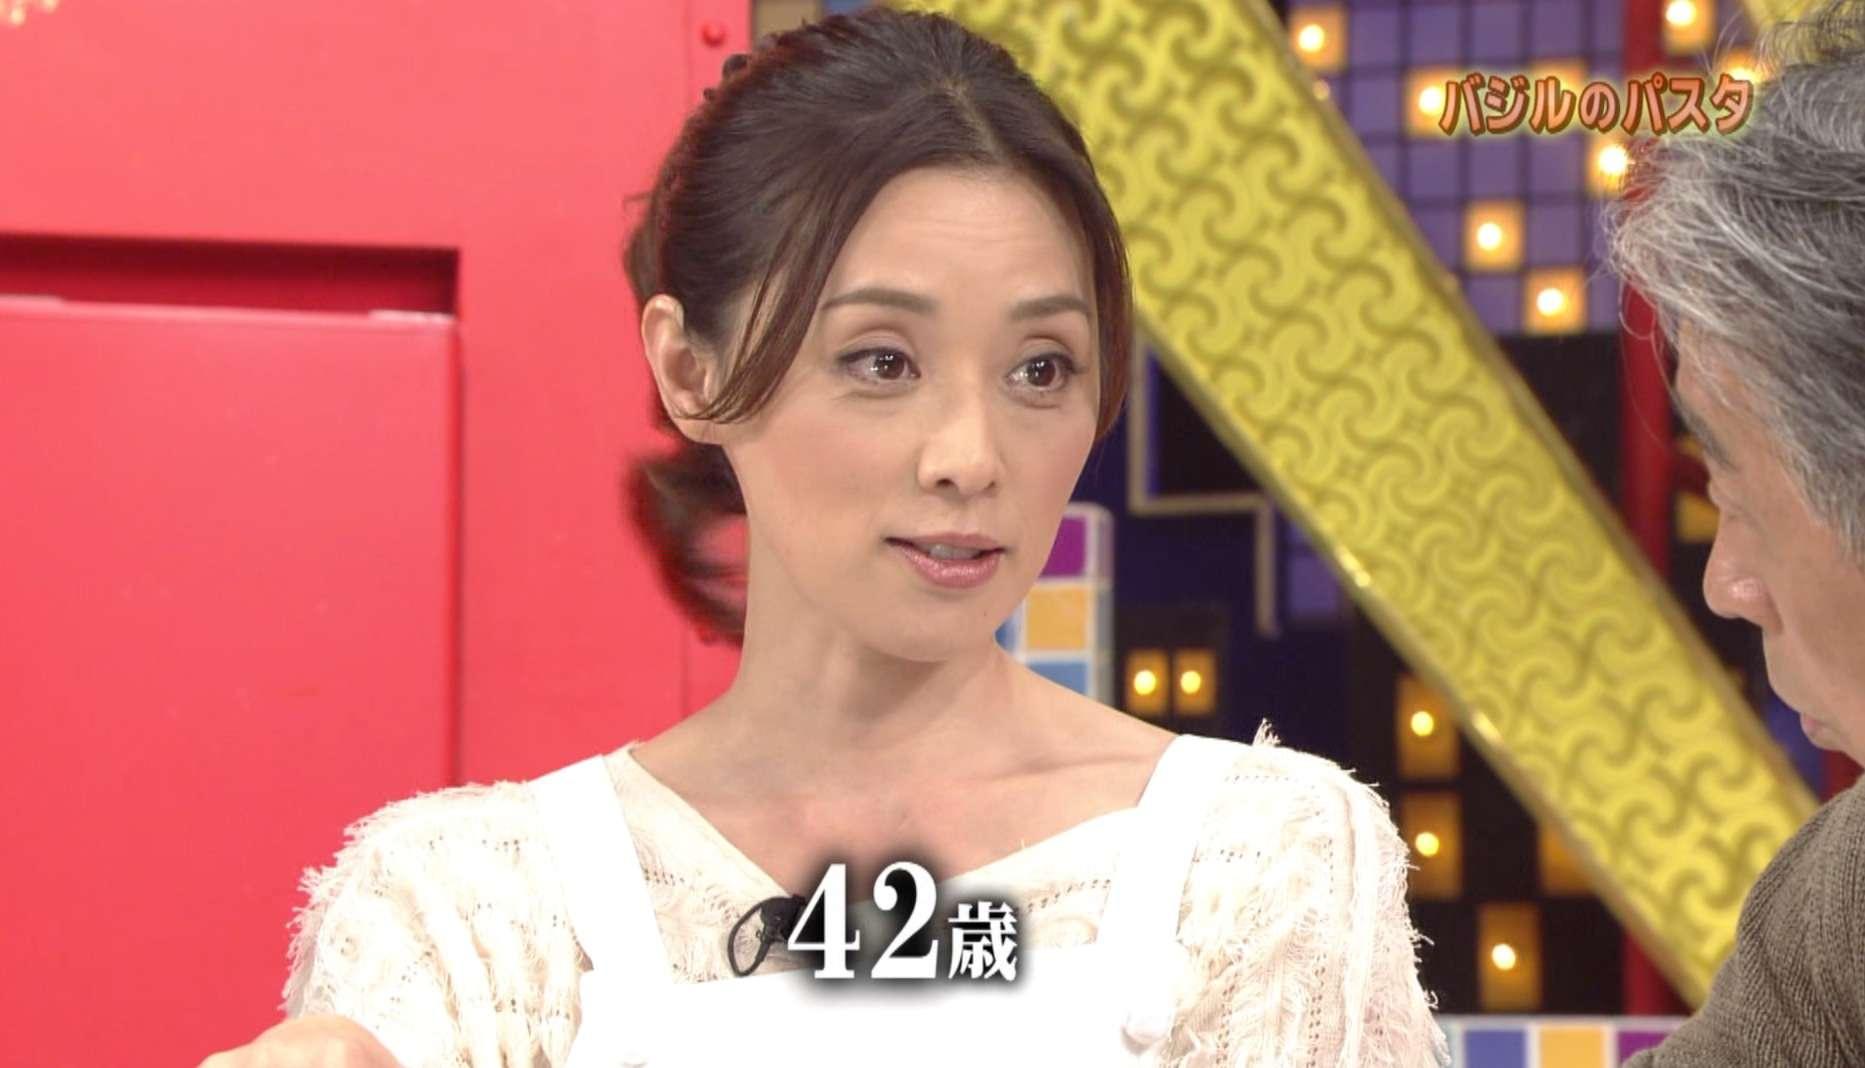 大塚寧々(45歳)が劣化